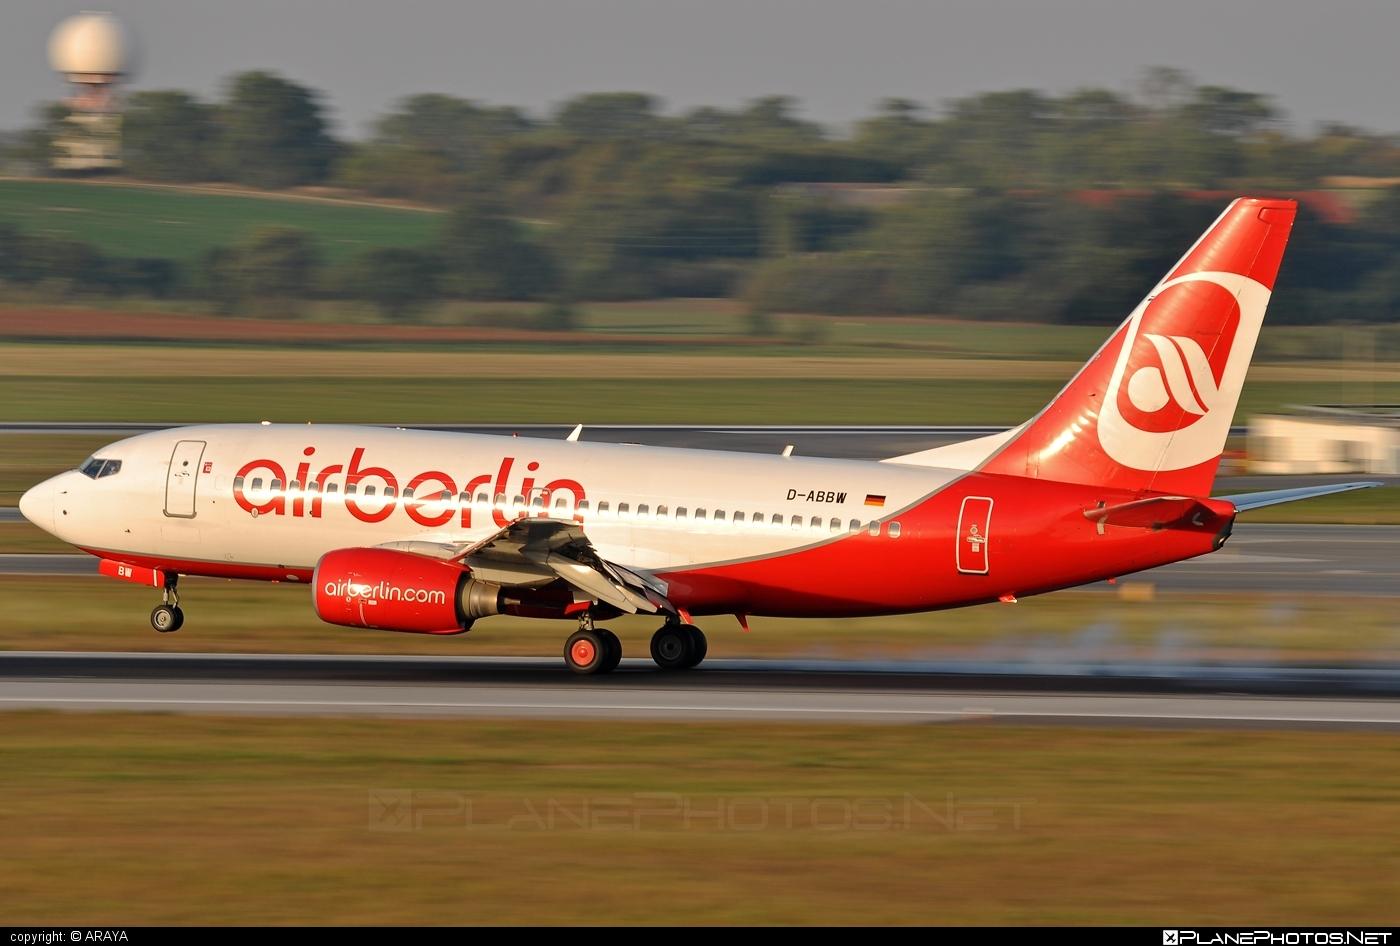 Boeing 737-700 - D-ABBW operated by Air Berlin #airberlin #b737 #b737nextgen #b737ng #boeing #boeing737